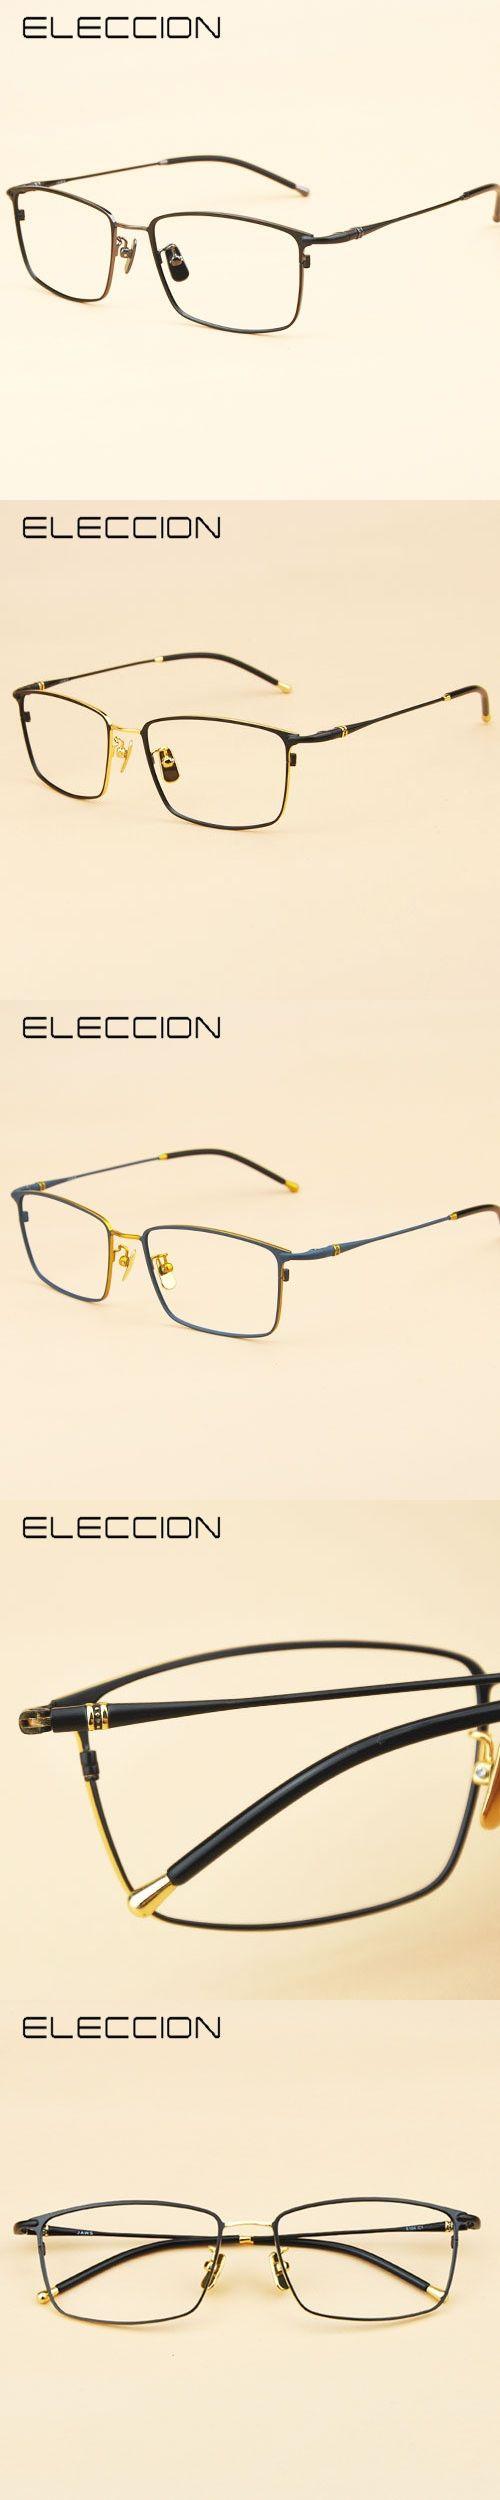 ELECCION Brand High - End Electroplating Alloy Optical Prescription Glasses Frame Men 's Full Frame Eyewear Good Quality